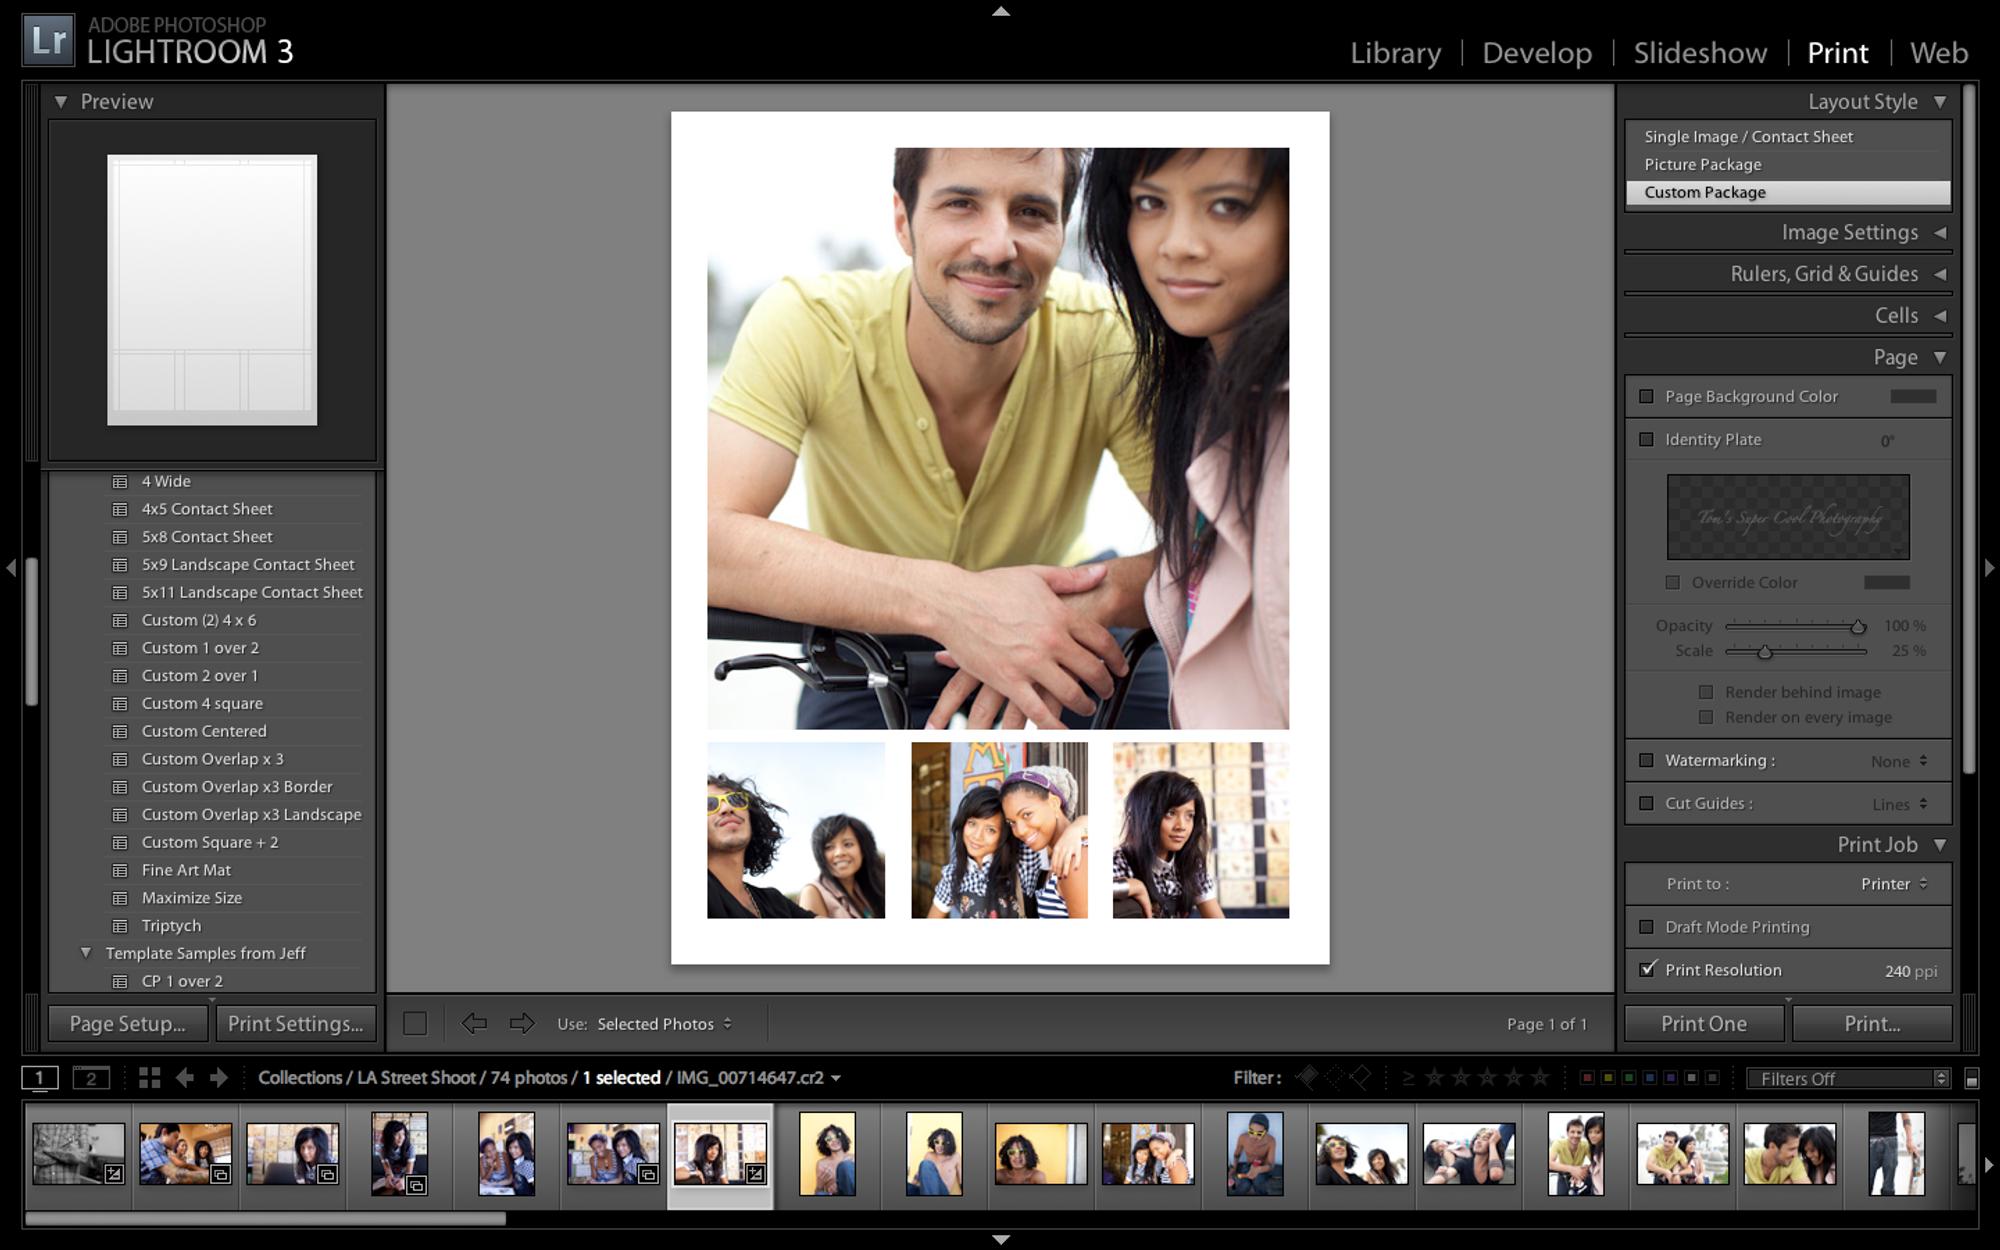 hvordan skanne bilder i photoshop elements